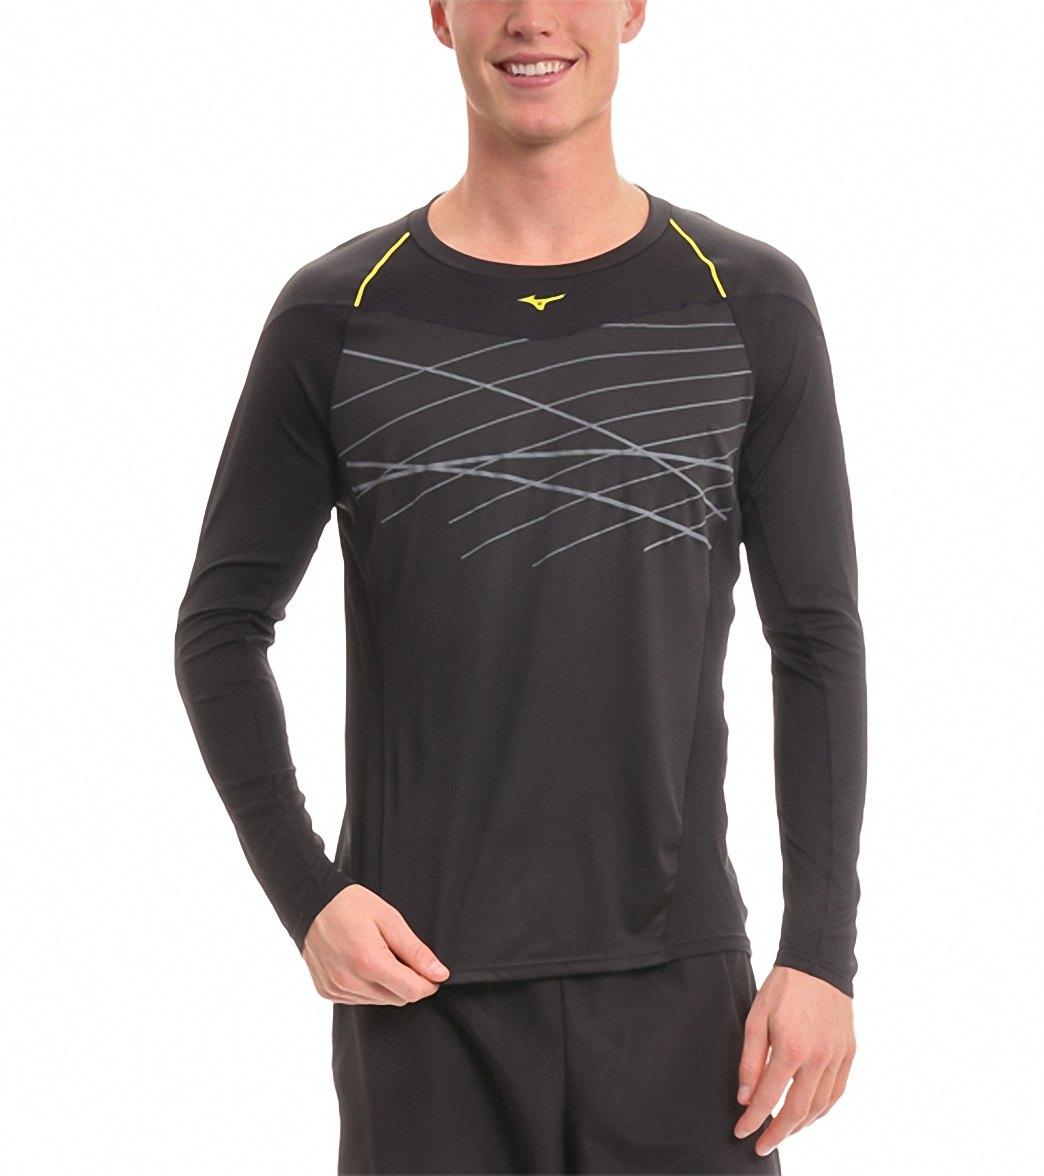 6a67b122da2 Mizuno Men's Venture Long Sleeve Running Shirt at SwimOutlet.com - Free  Shipping